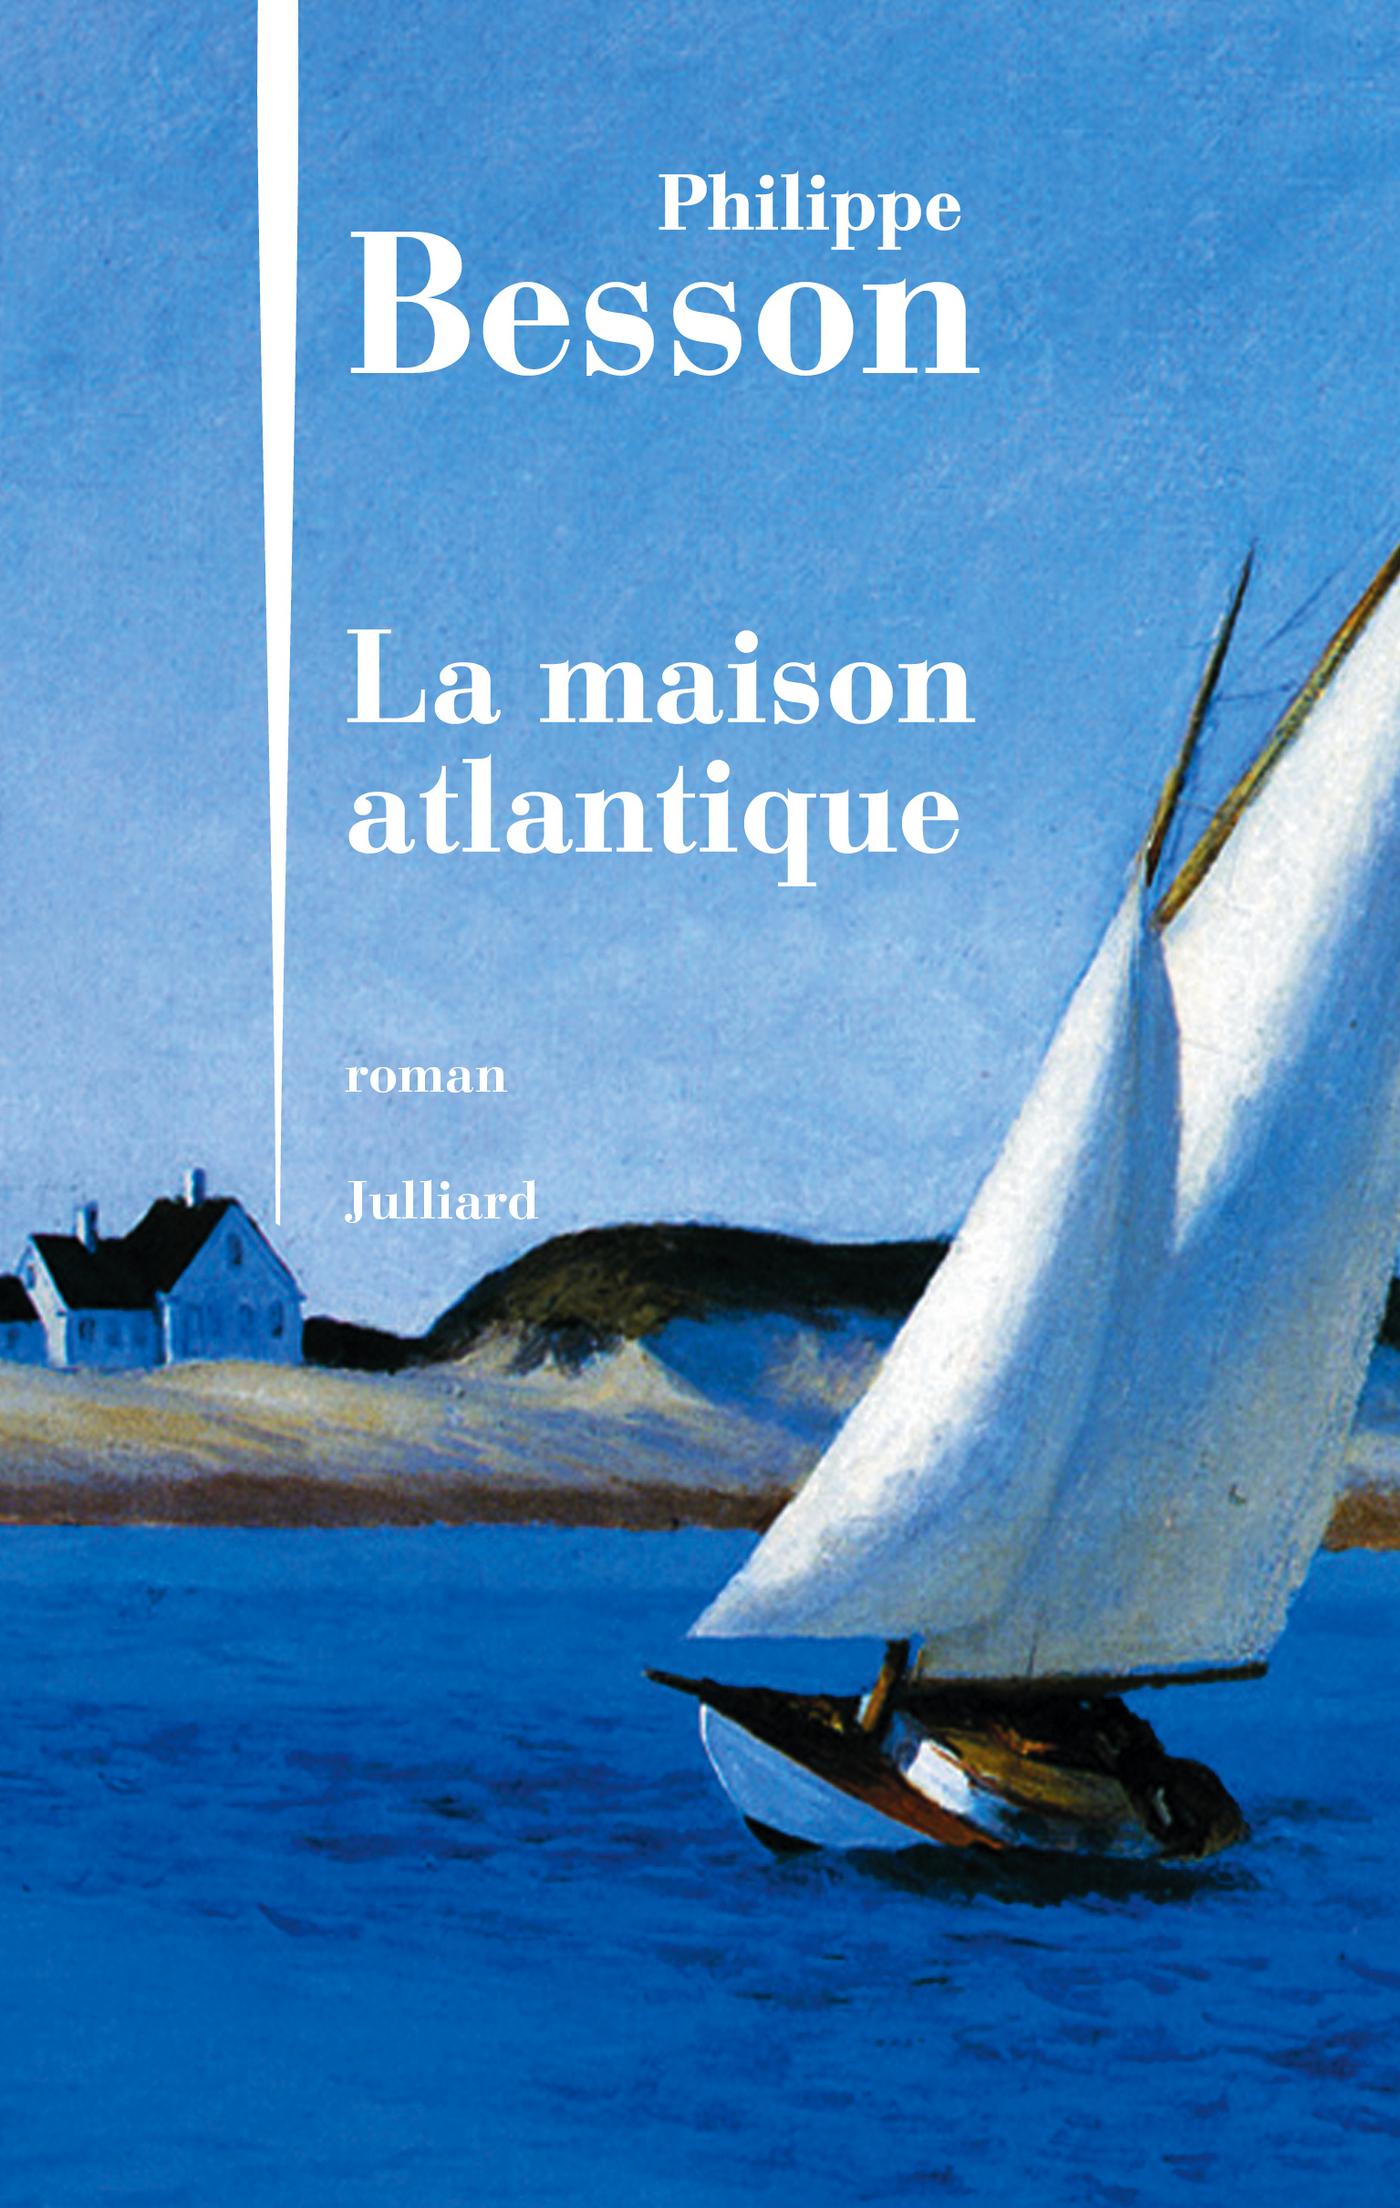 La Maison atlantique | BESSON, Philippe